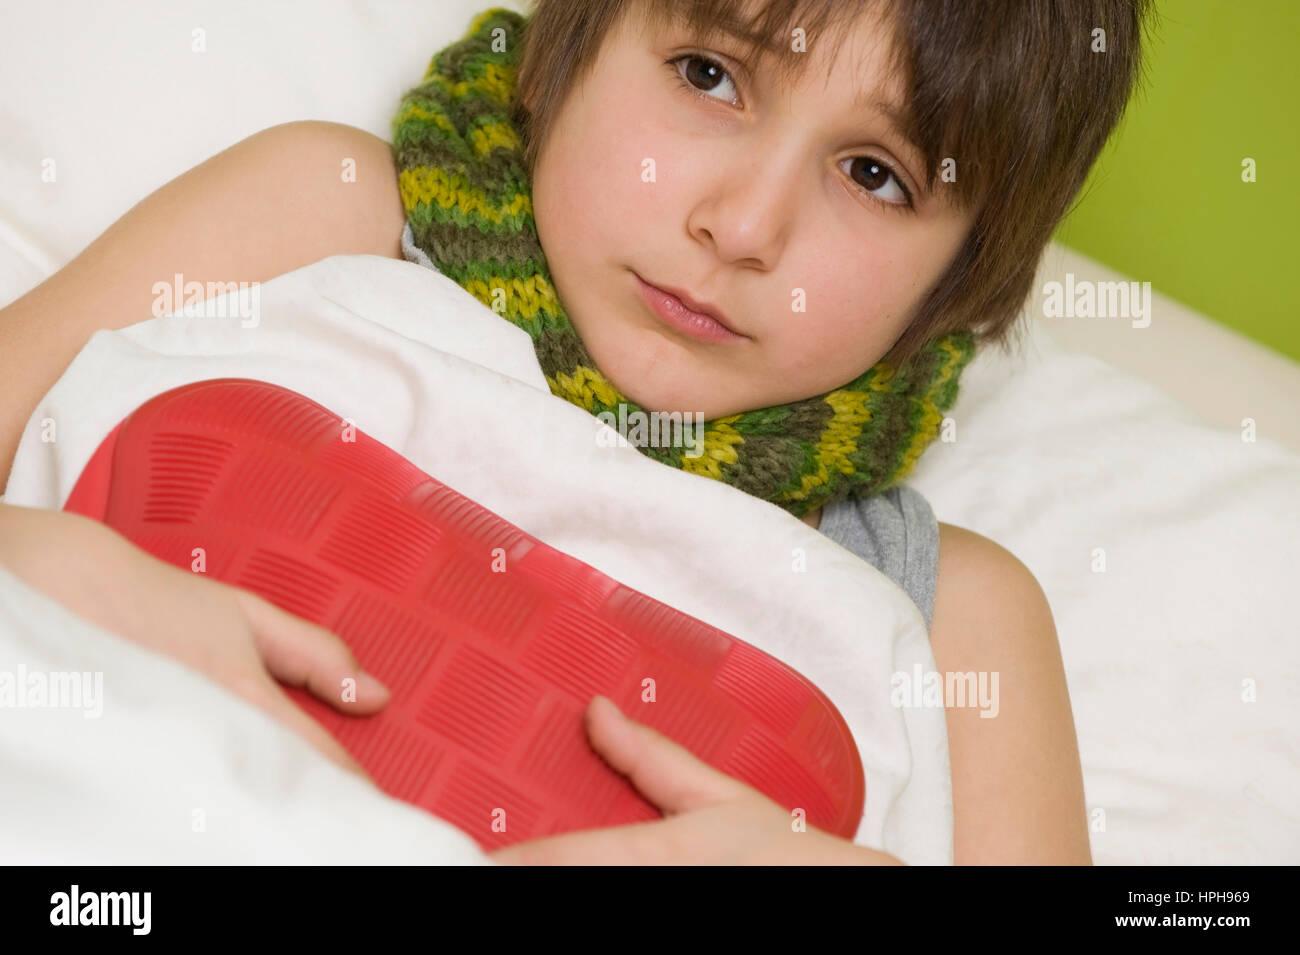 Kranker Junge mit Waermeflasche im Bett - sick boy with hot-water bottle in bed, Model released - Stock Image